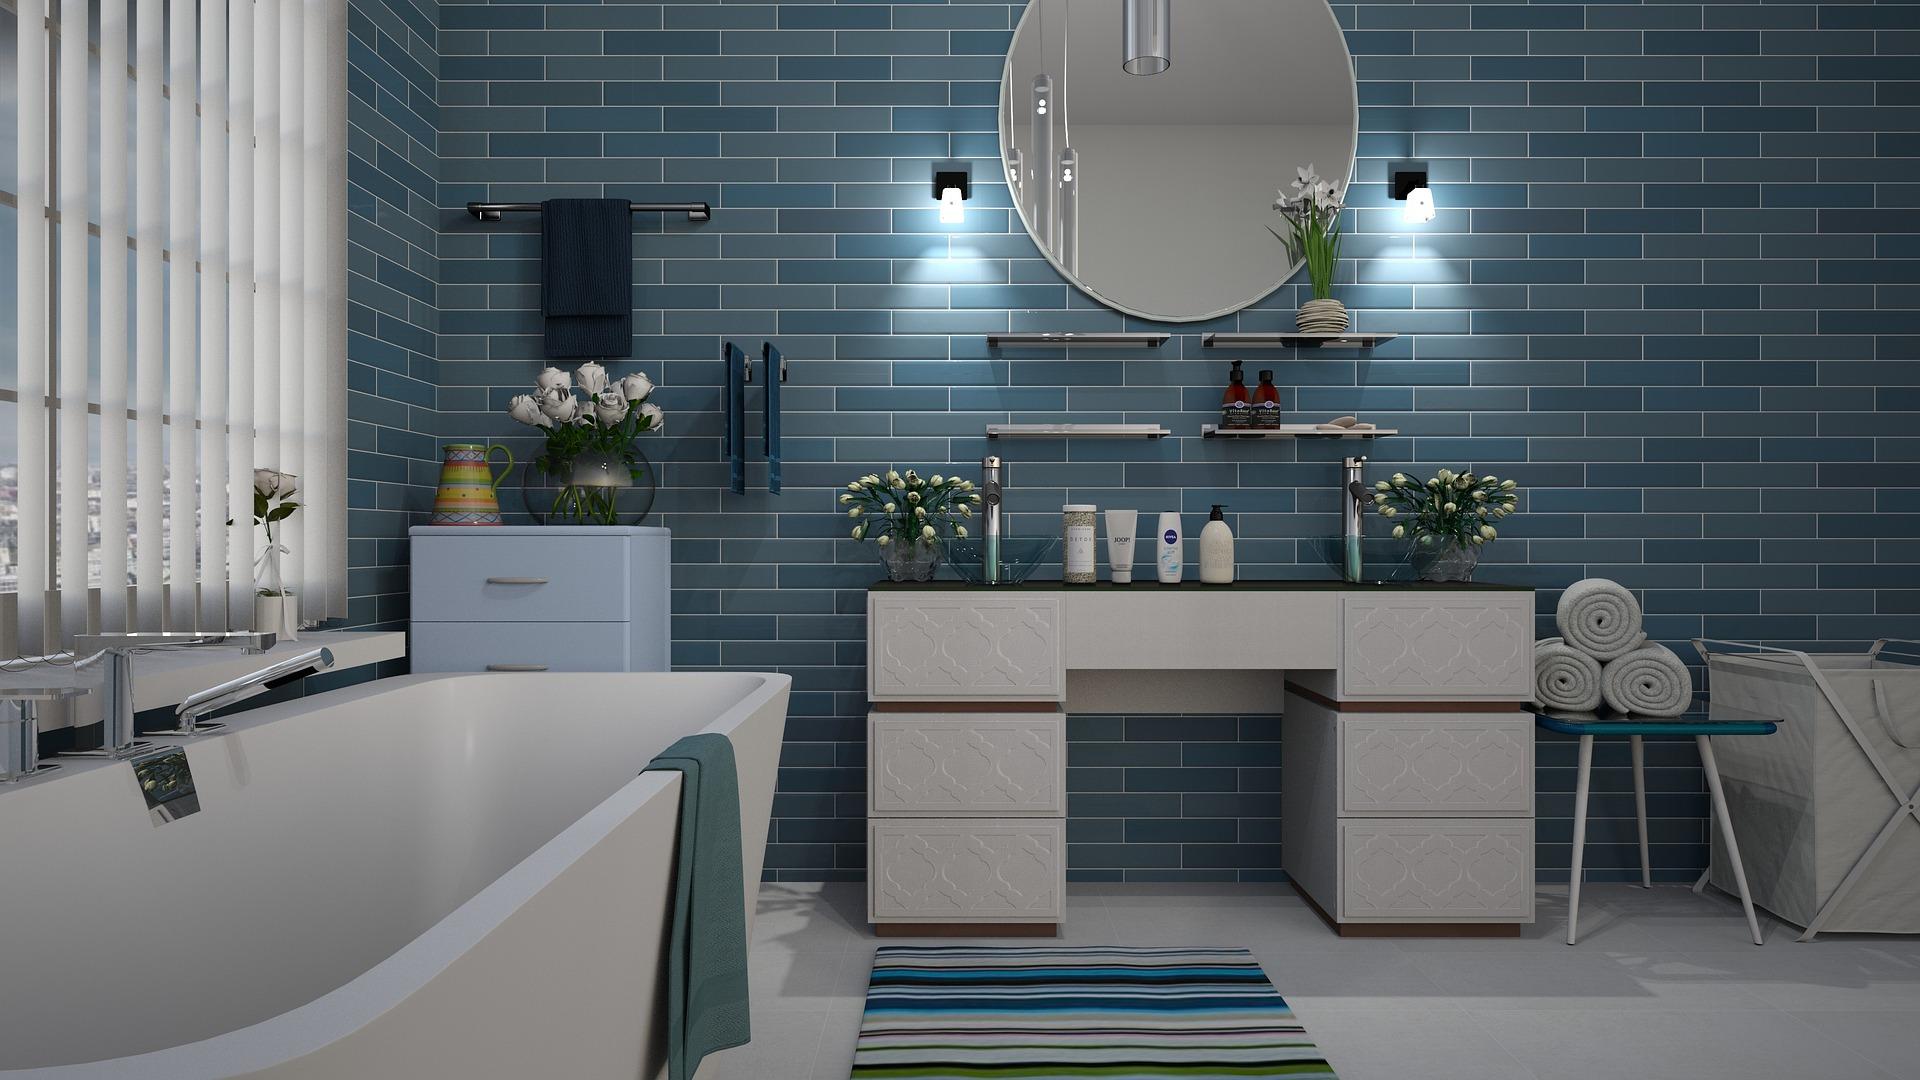 Best Bathroom Design Ideas You Should Try The House Shop Blog